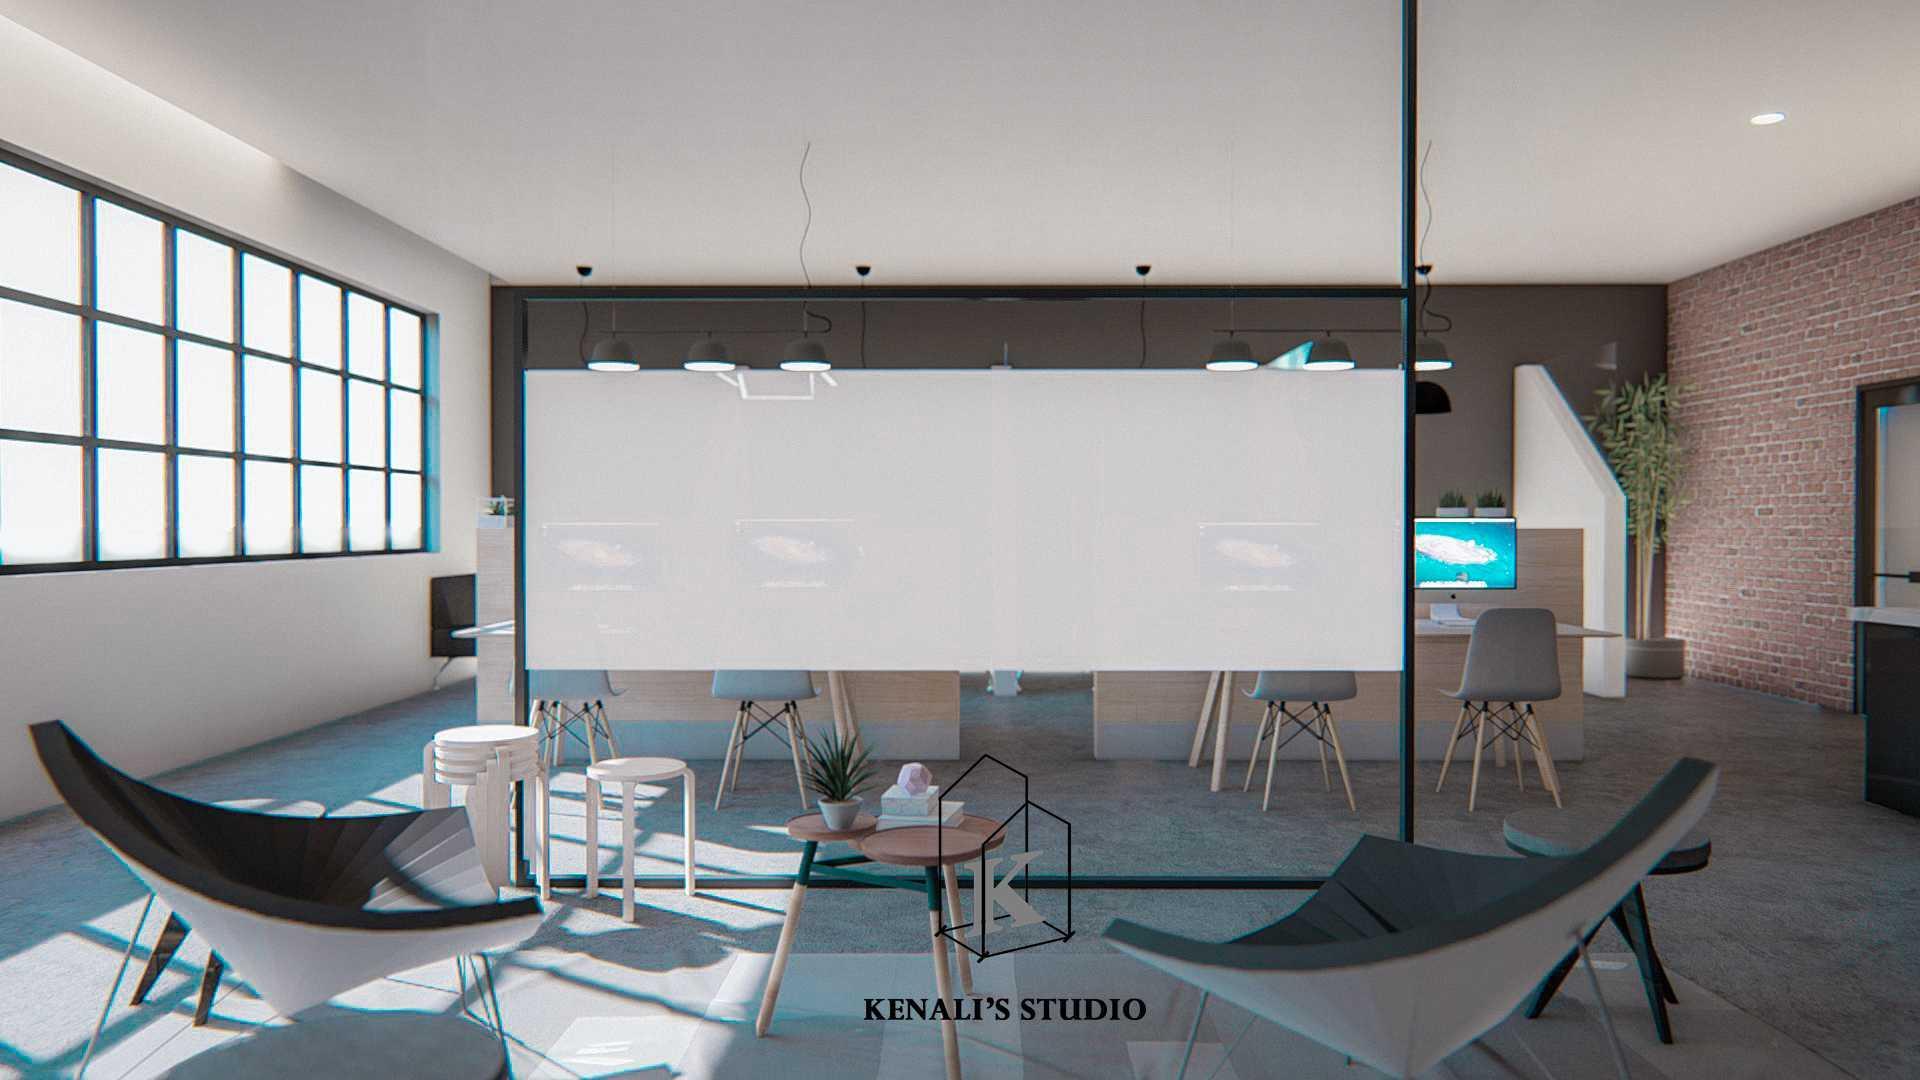 Kenali's Studio Co-Working Space Surabaya, Kota Sby, Jawa Timur, Indonesia Surabaya, Kota Sby, Jawa Timur, Indonesia Kenalis-Studio-Co-Working-Space  93664